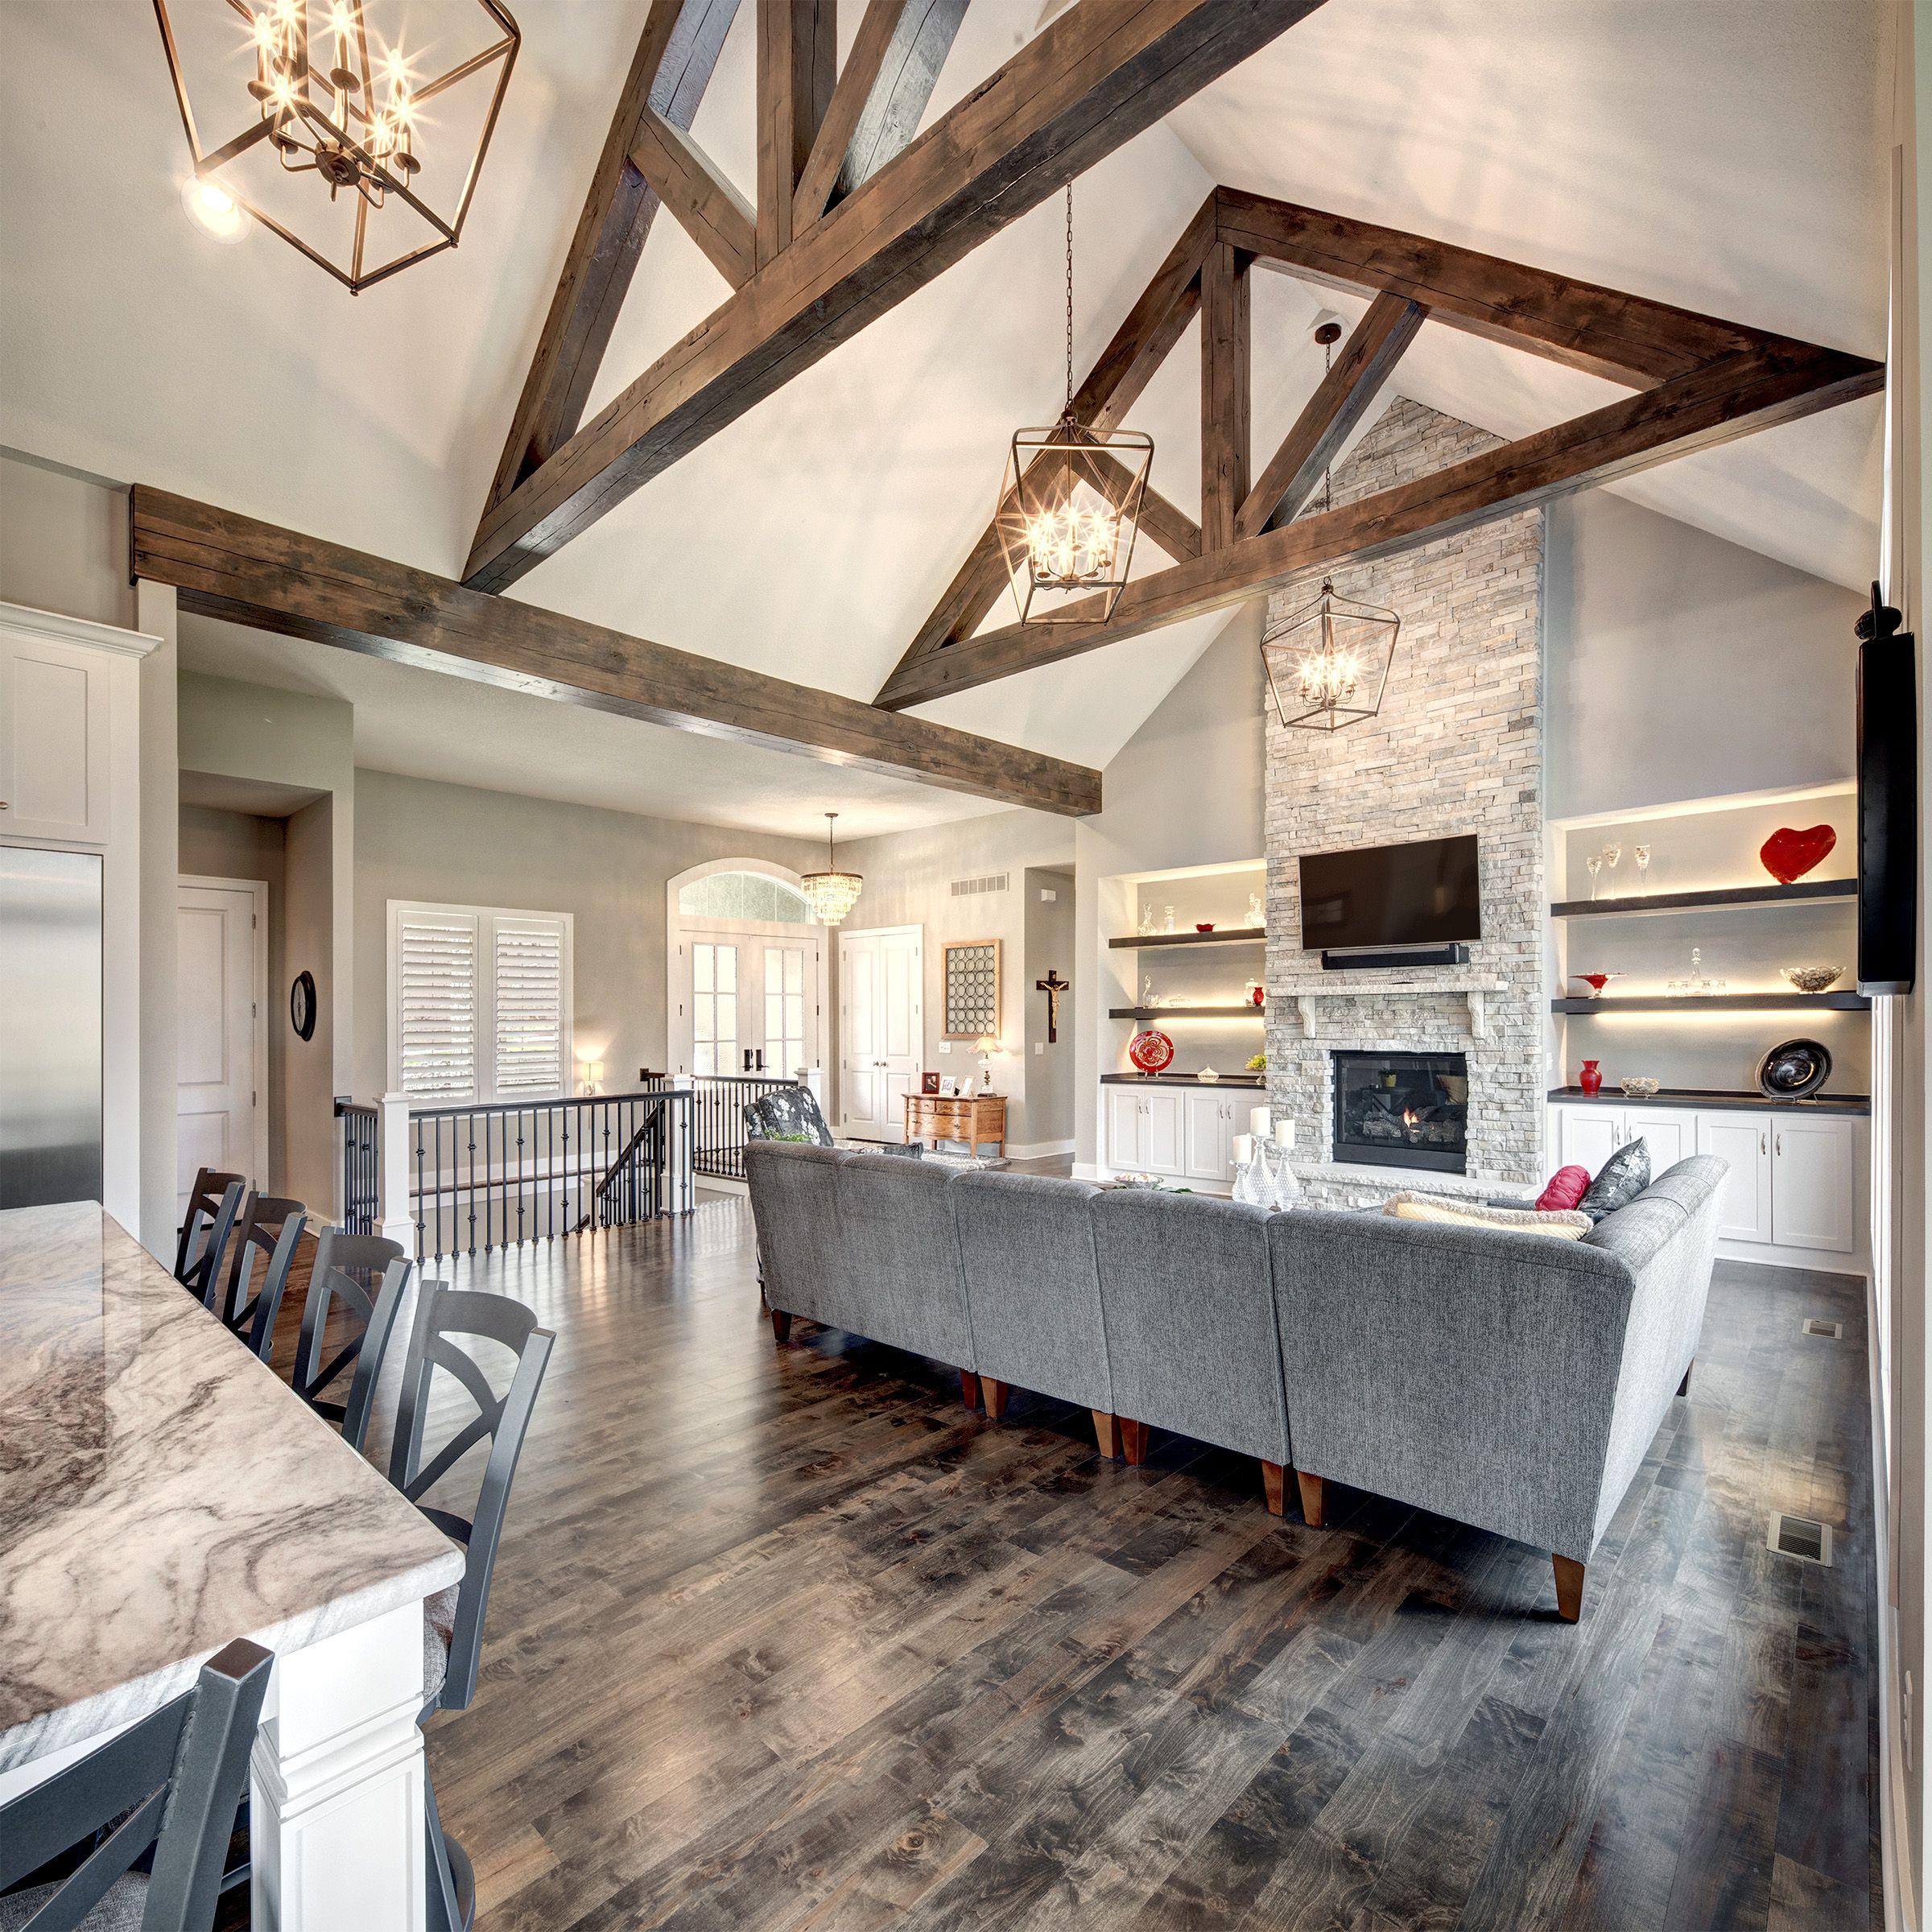 Hearth Room With Wood Beams Farm House Living Room Vaulted Ceiling Living Room Beams Living Room